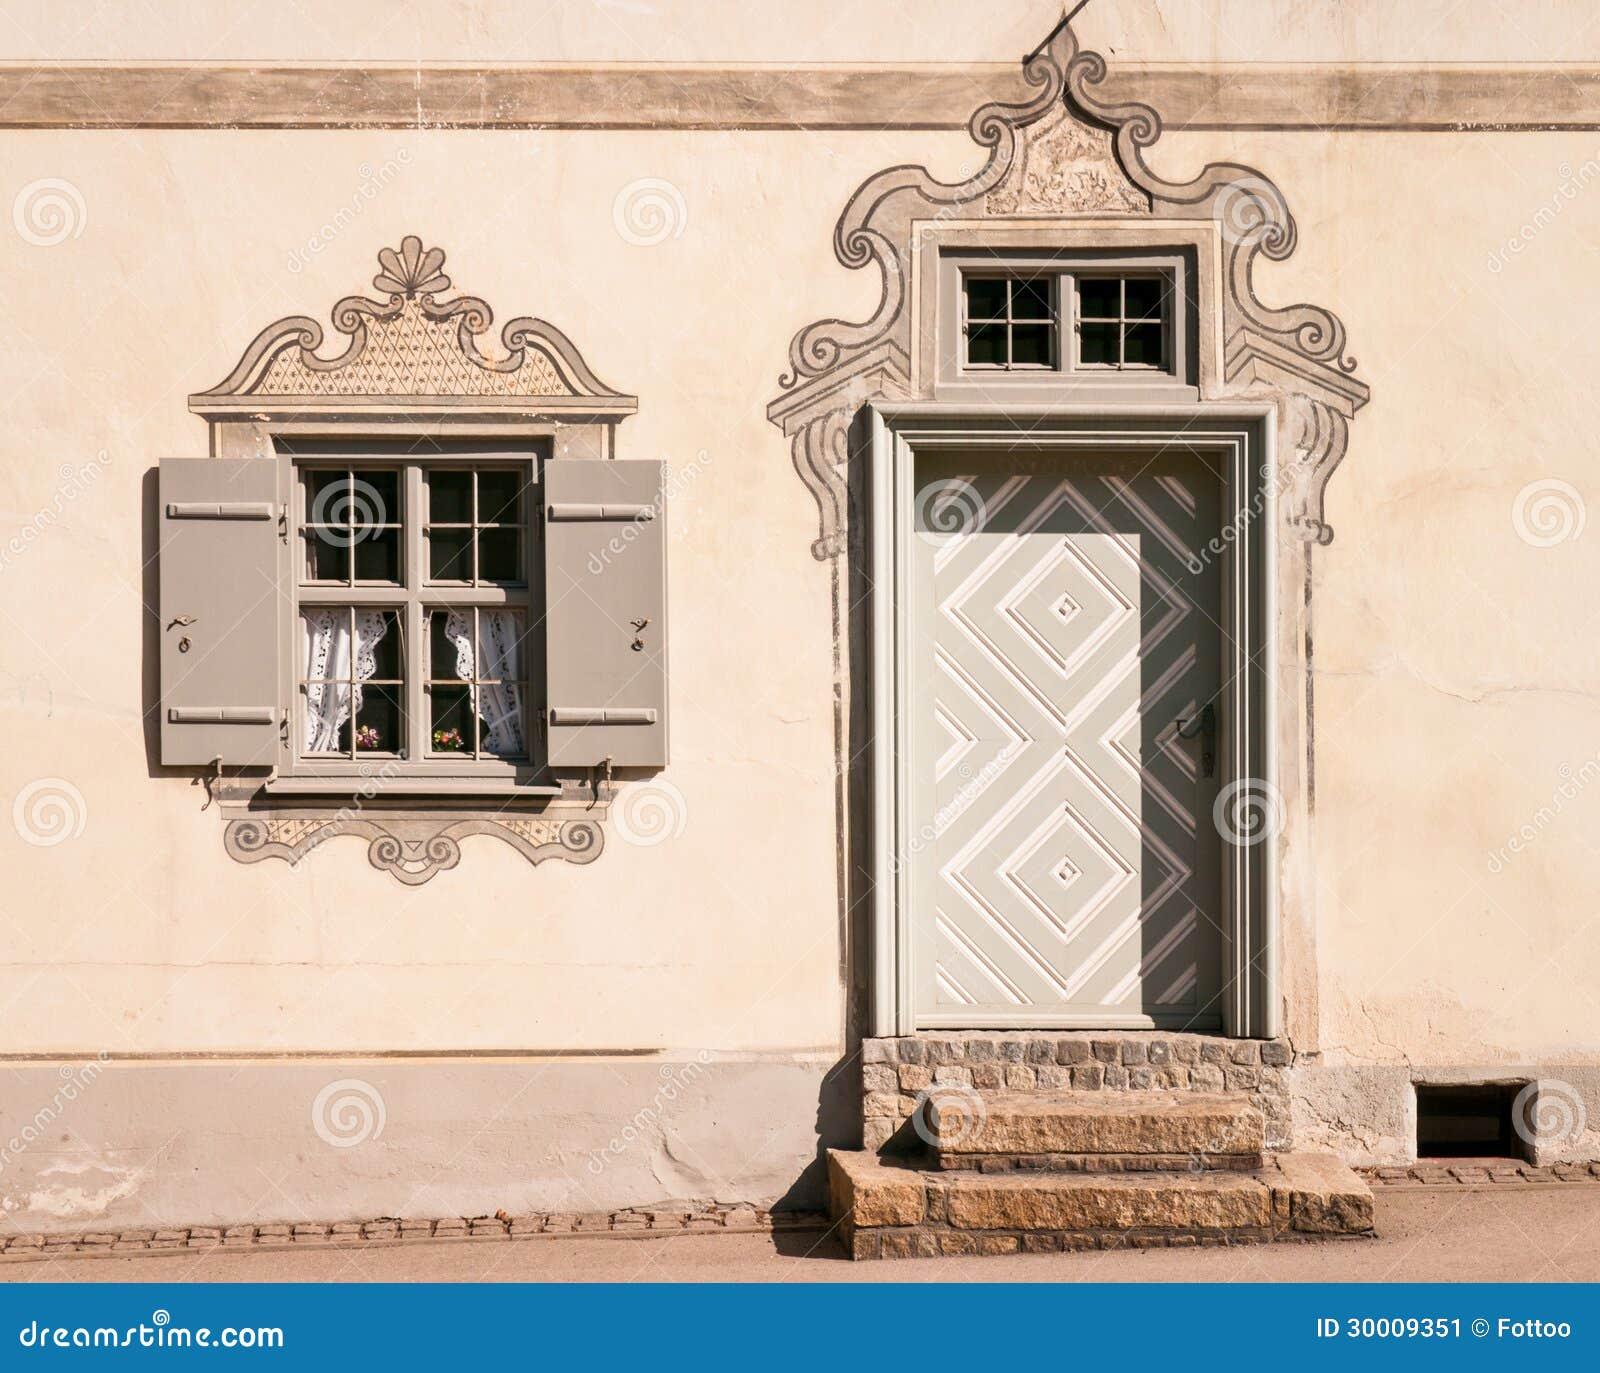 1133 #84A823 Beautiful Old Wooden Door Close Up. image Beautiful Wooden Doors 46731300